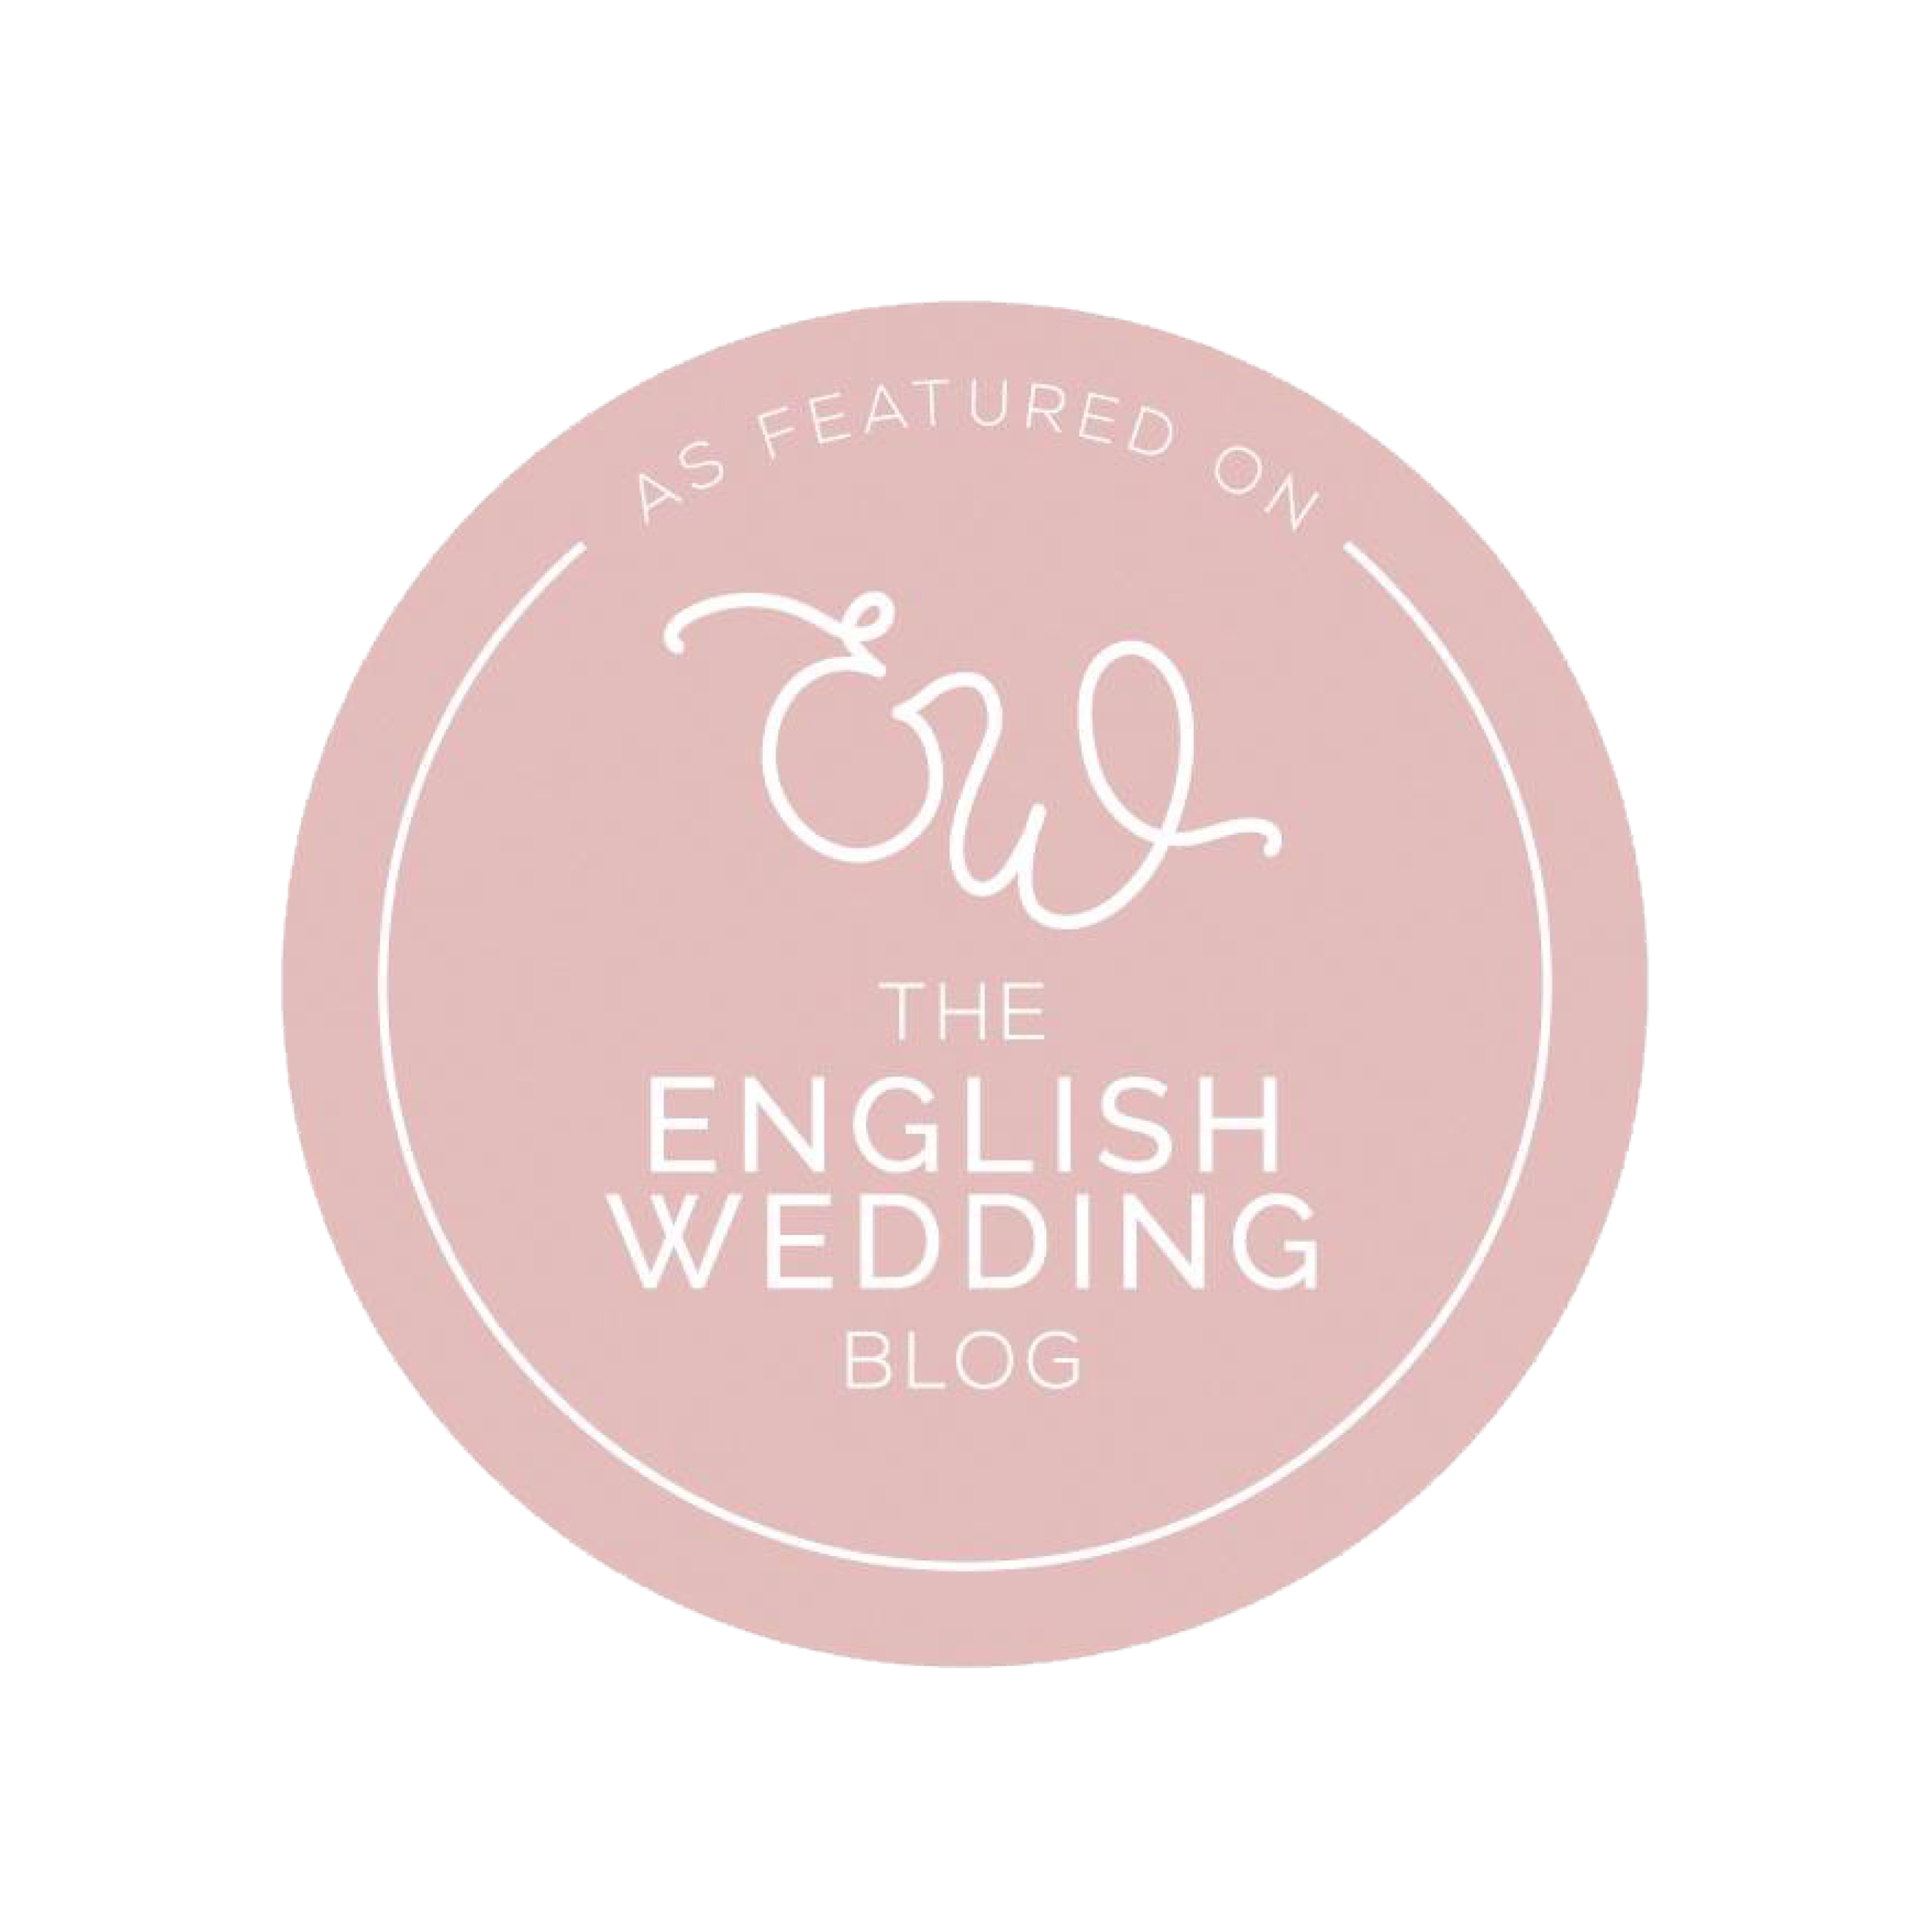 Terry Fox | The English Wedding Blog